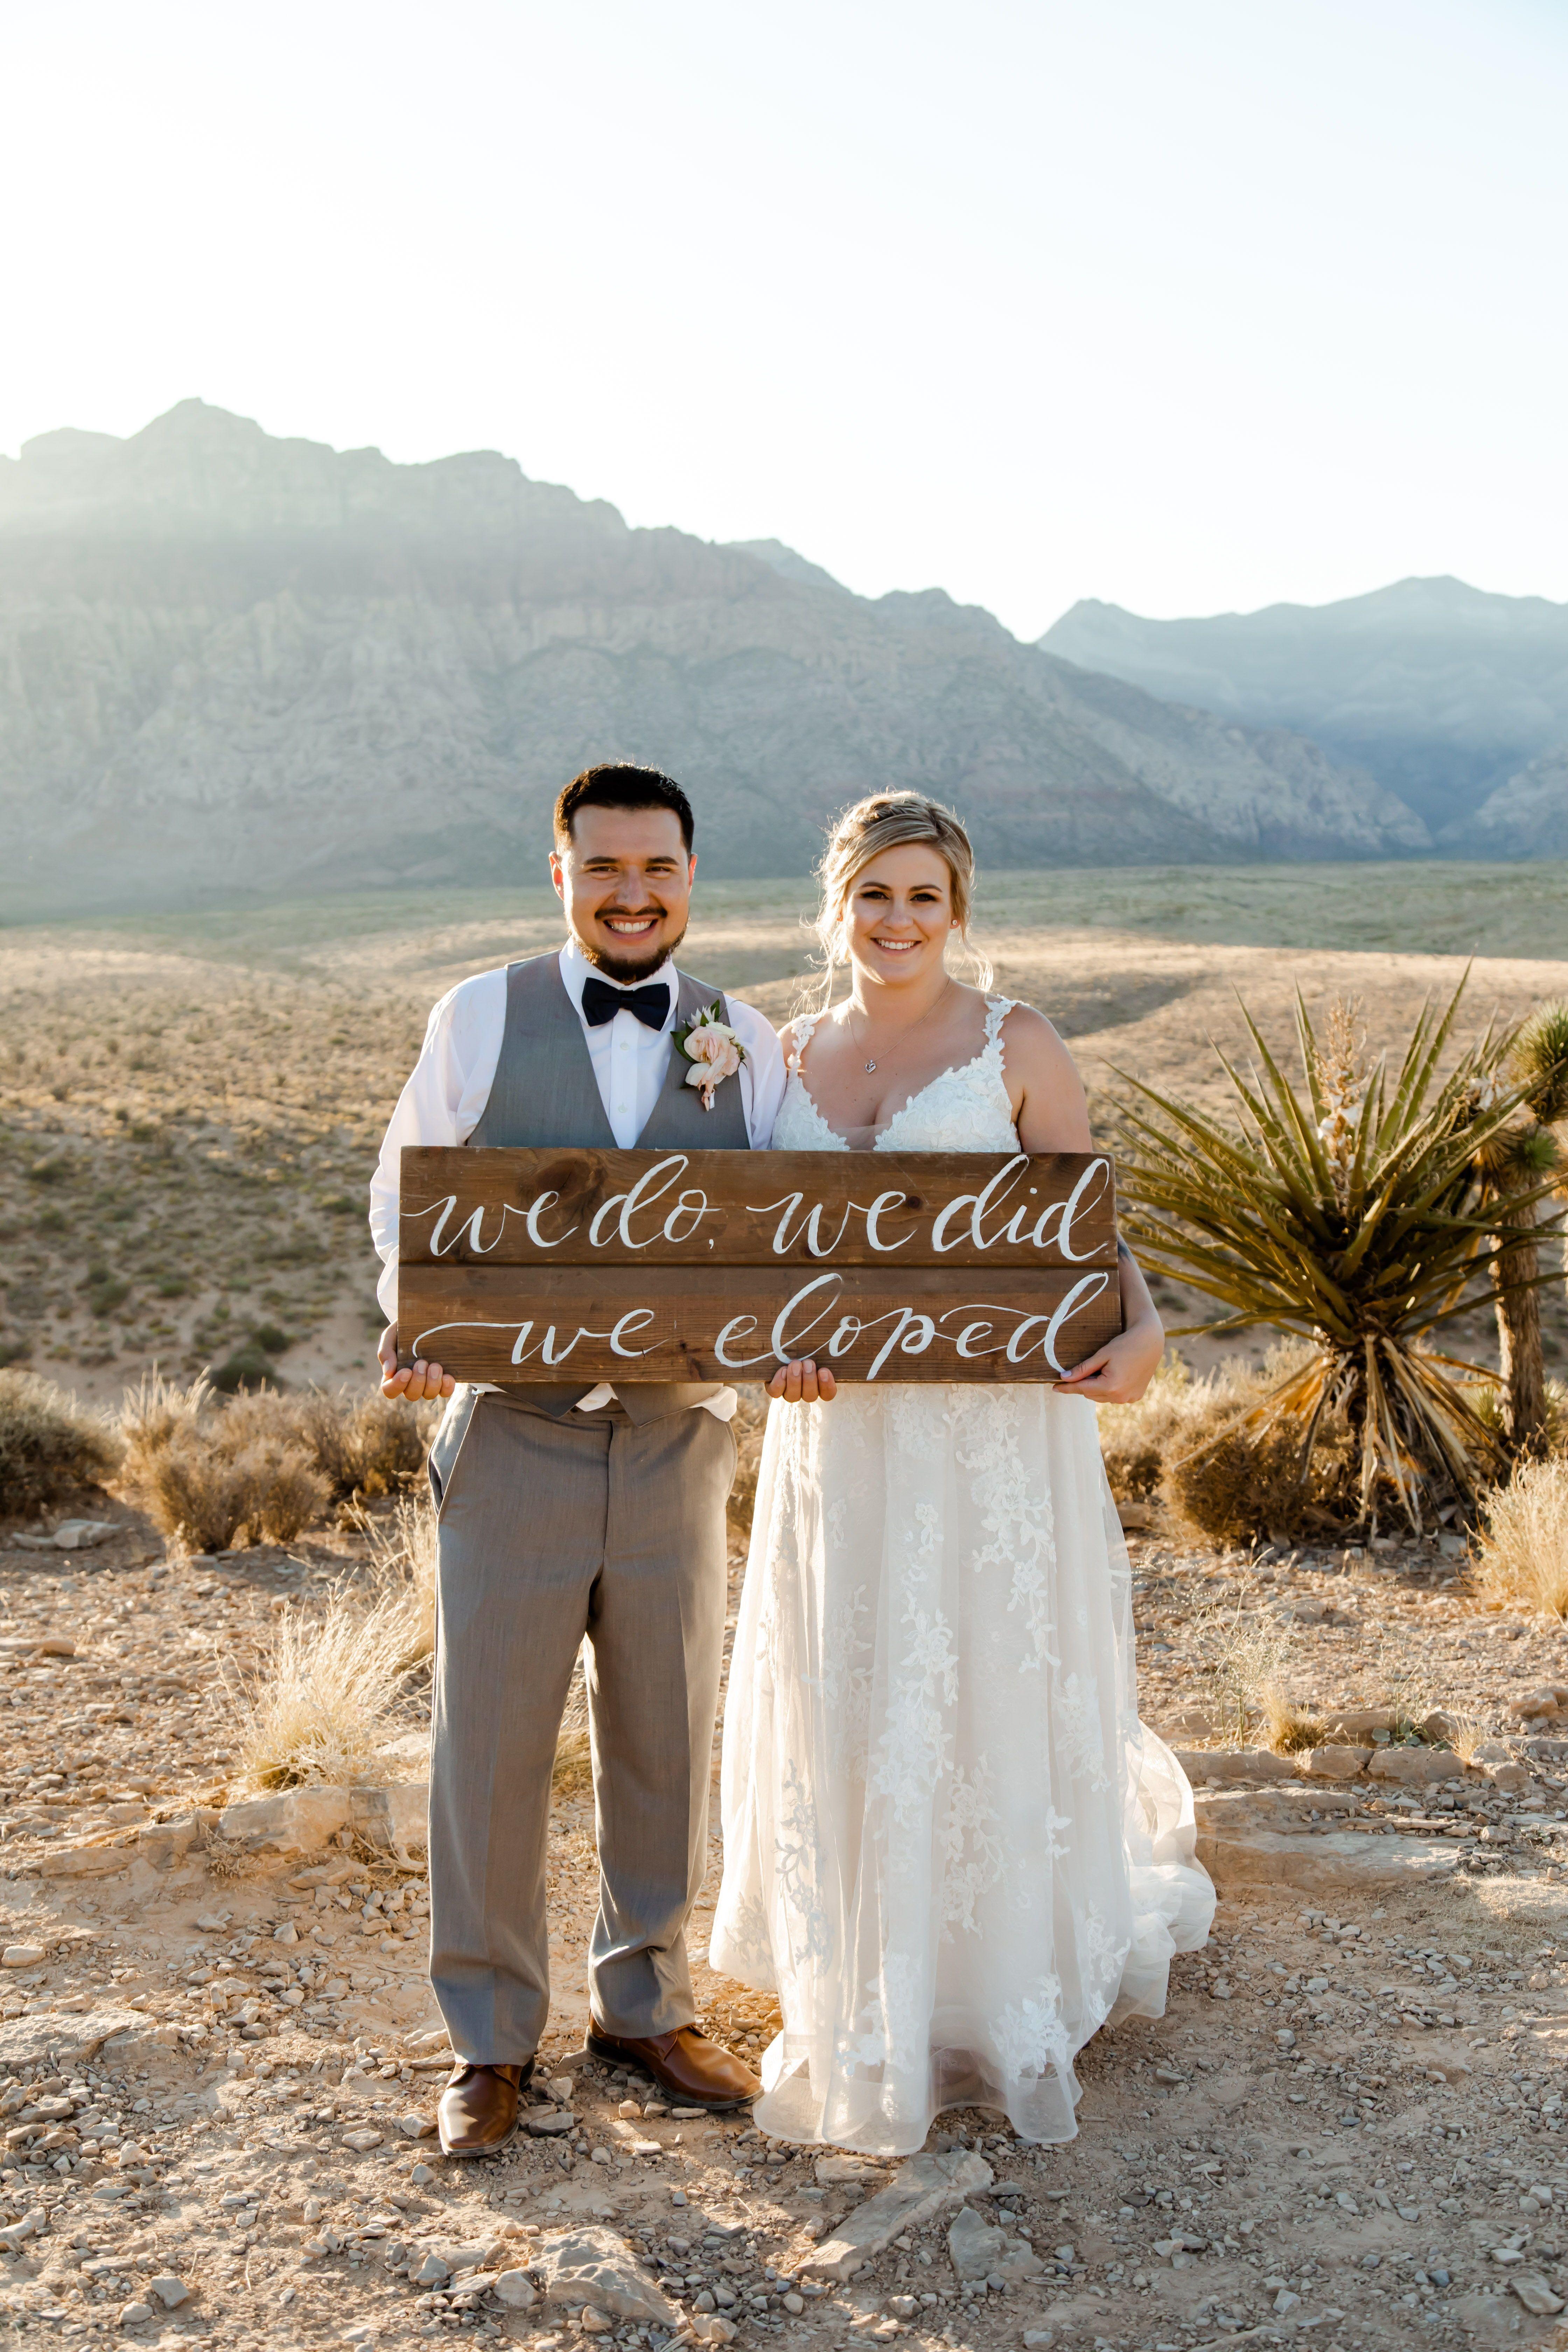 Las Vegas Elopement Packages Nevada Las Vegas Elopement Las Vegas Elopement Married In Vegas Vegas Wedding